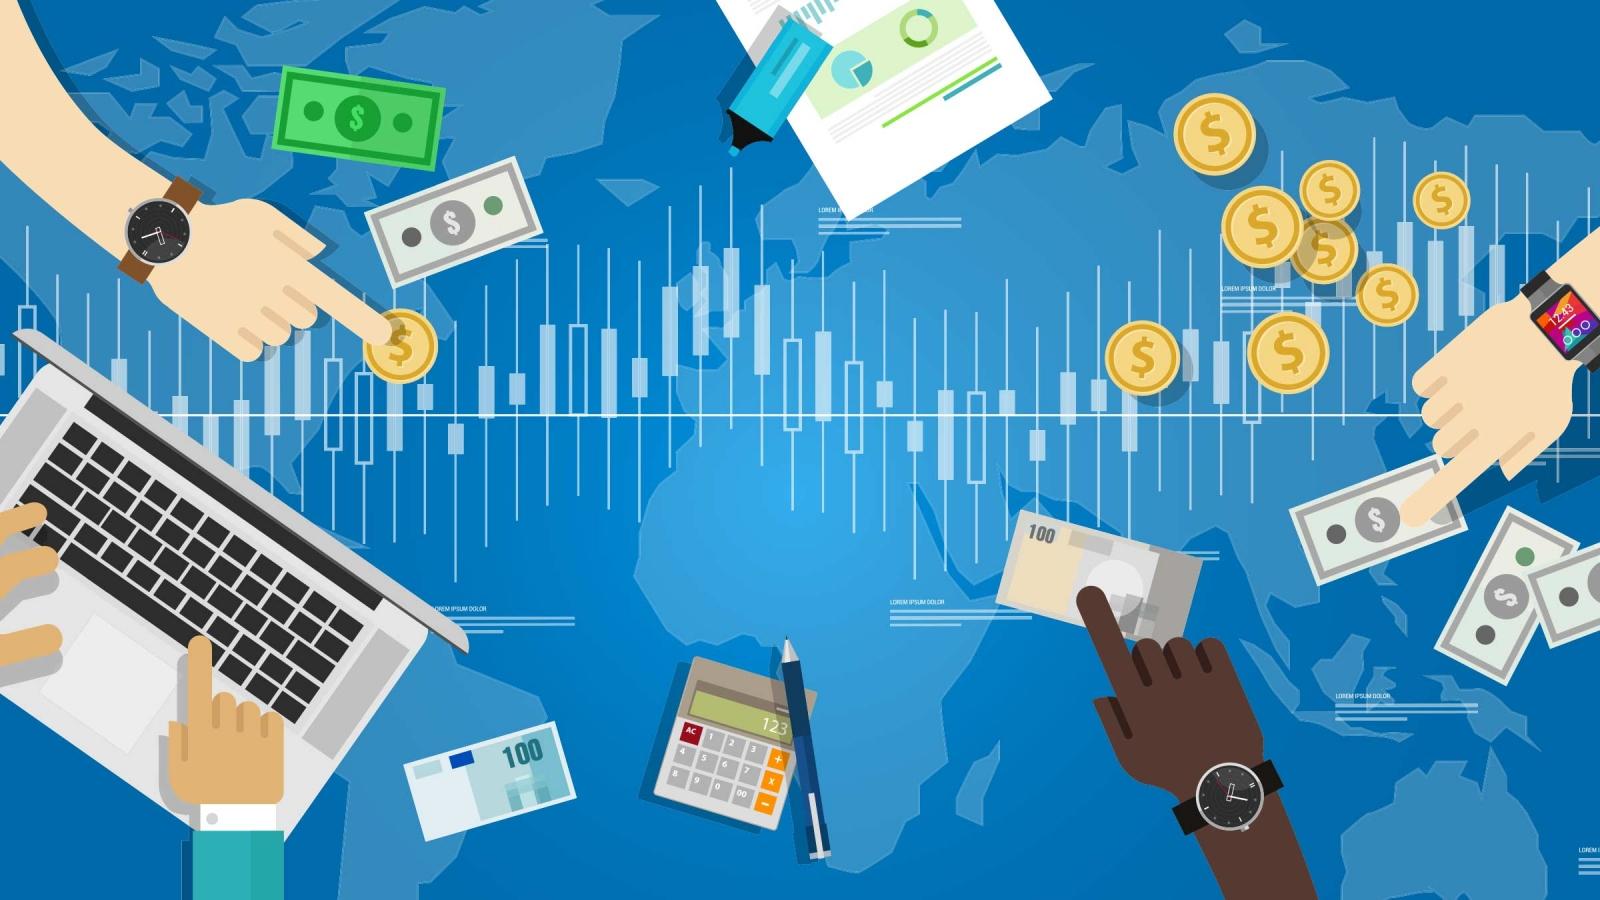 E-transaction market developed toward digital economy